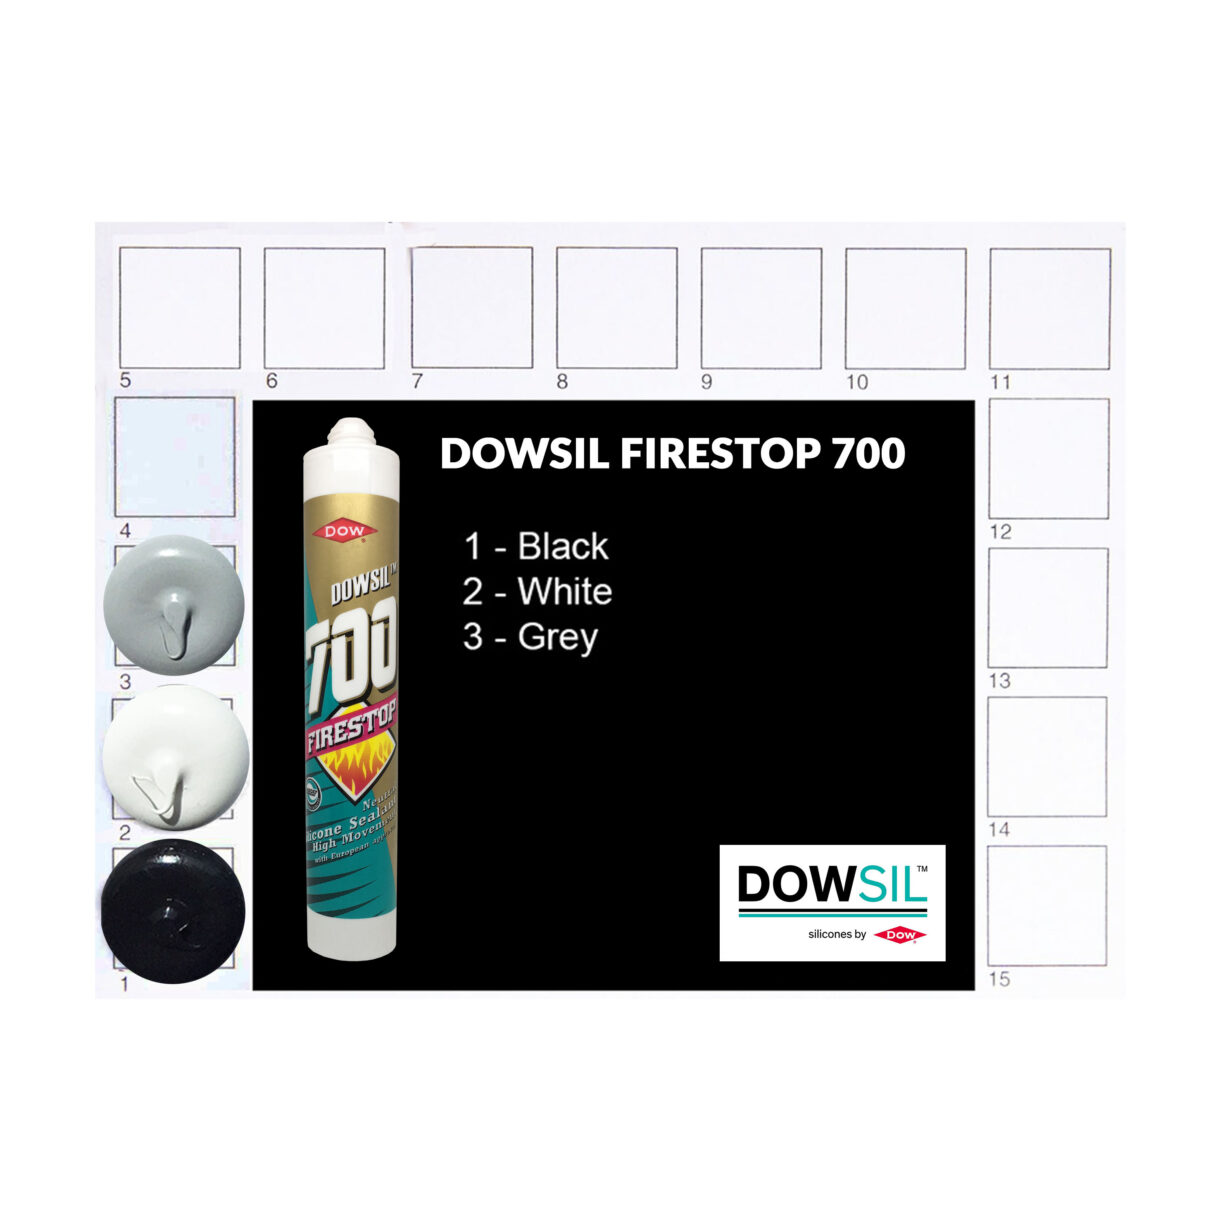 DOWSIL FIRESTOP 700